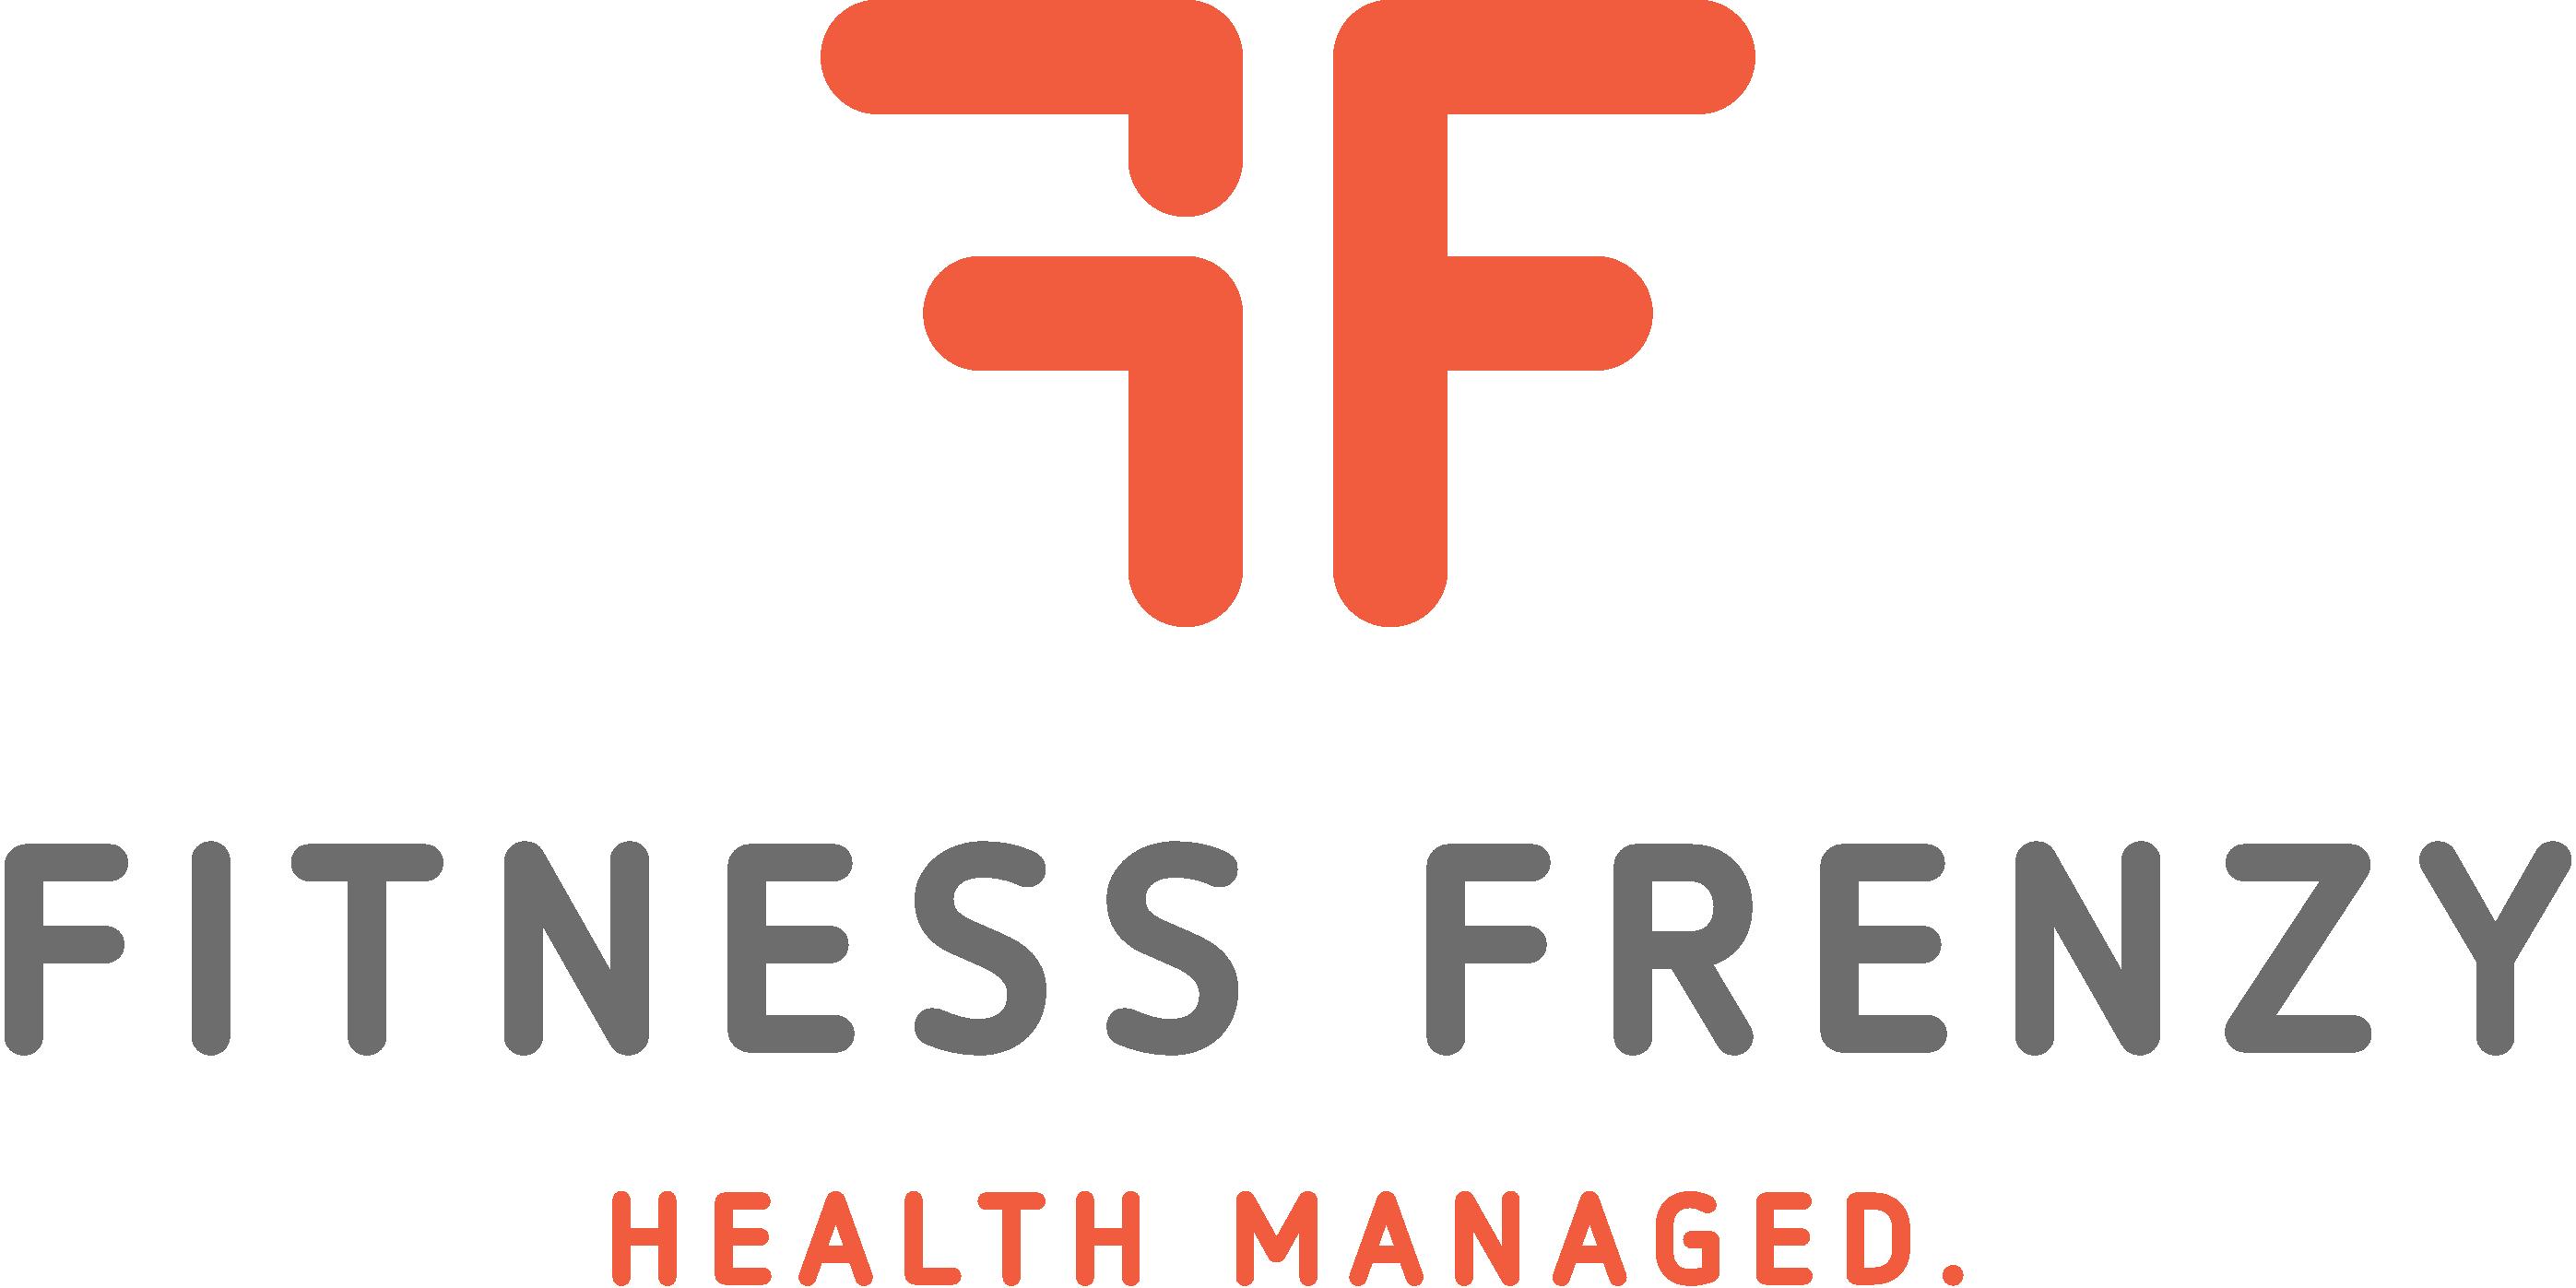 Christian Kruger Health LLC